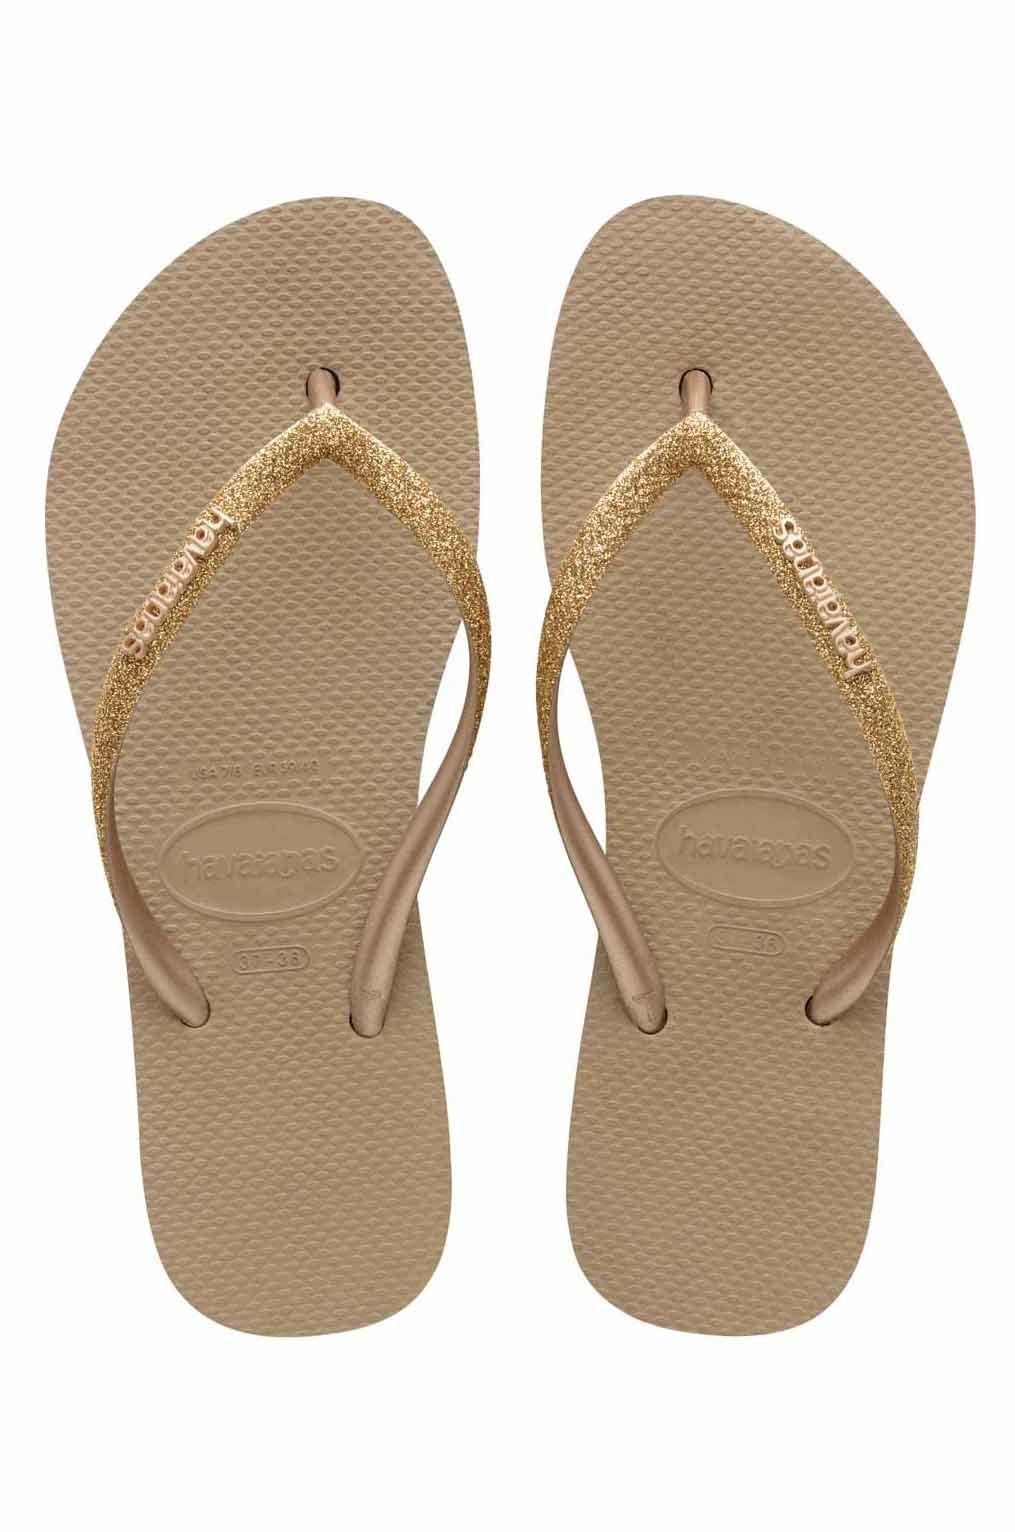 Havaianas Sandals SLIM FLATFORM GLITTER Rose Gold